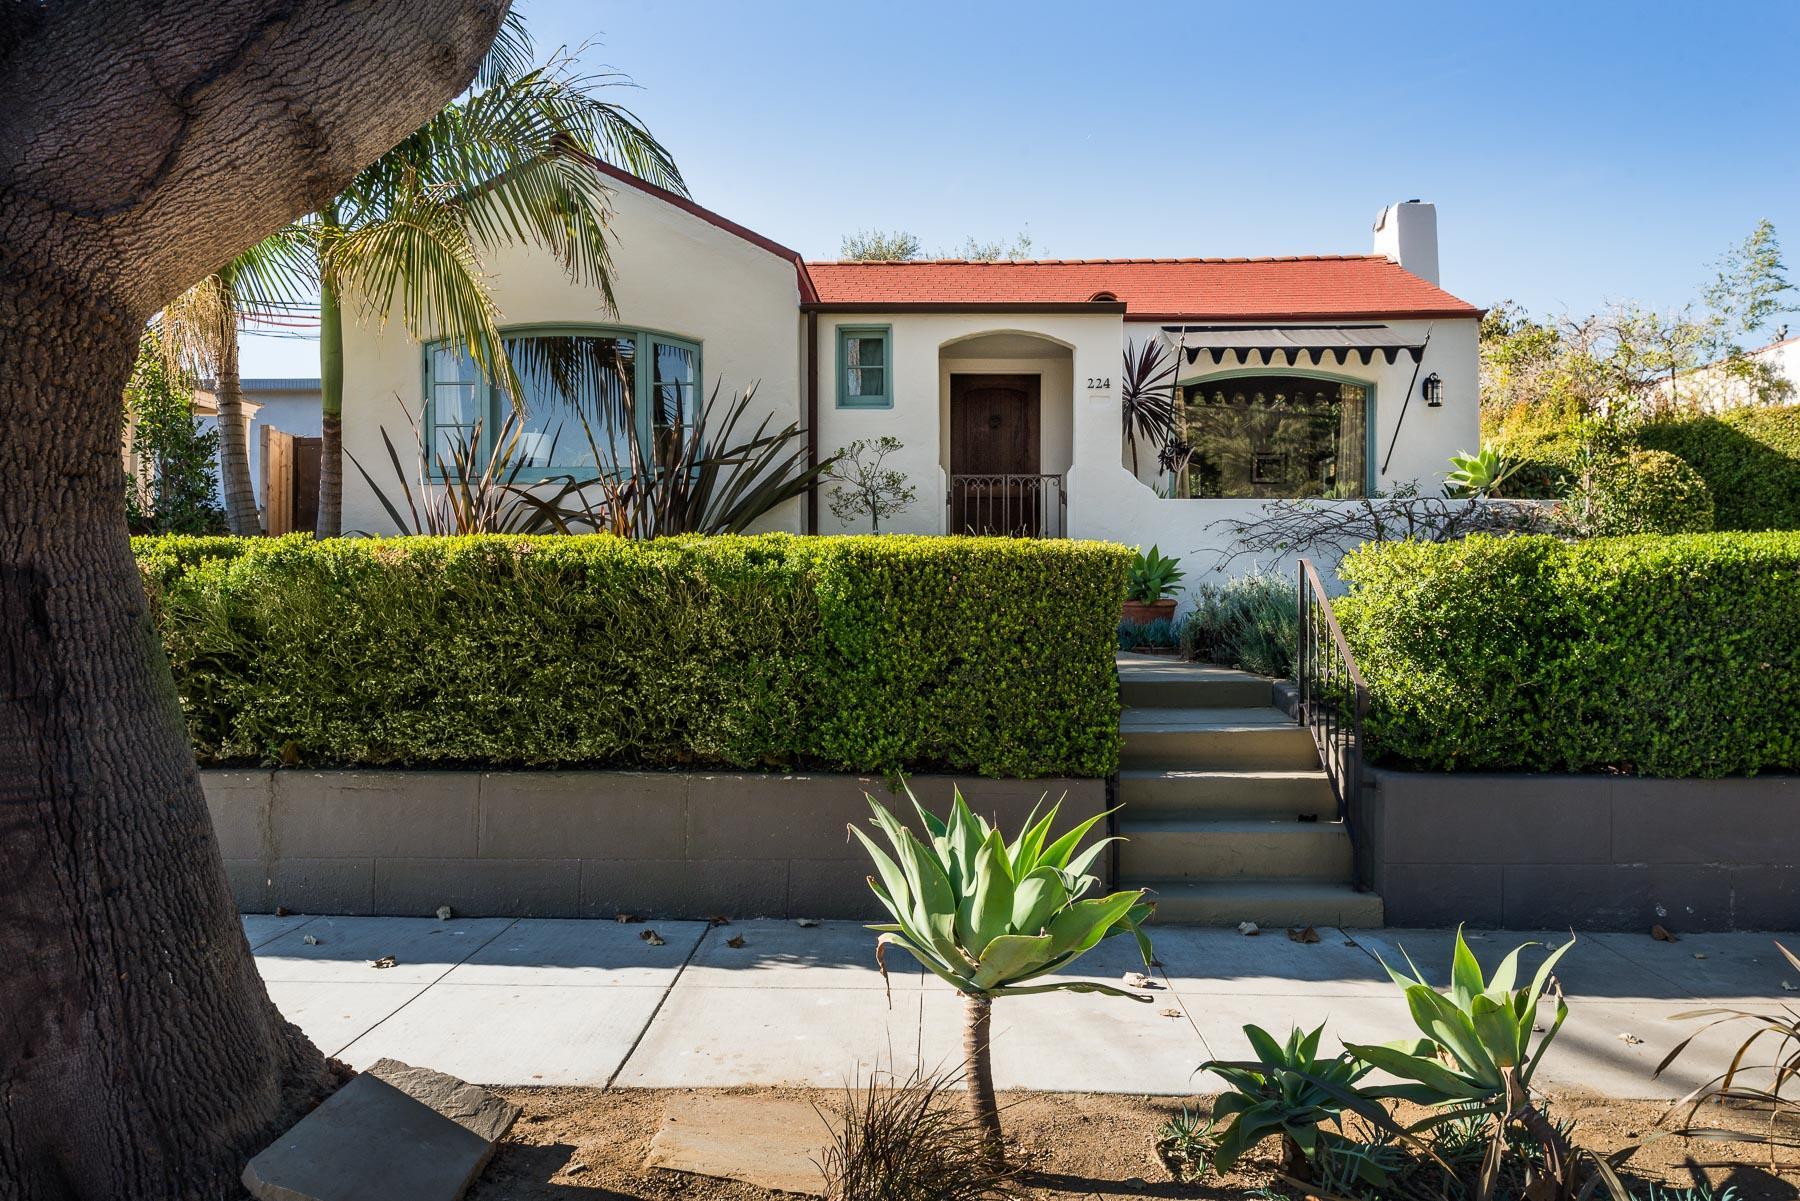 Property photo for 224 W Cota St Santa Barbara, California 93101 - 16-606